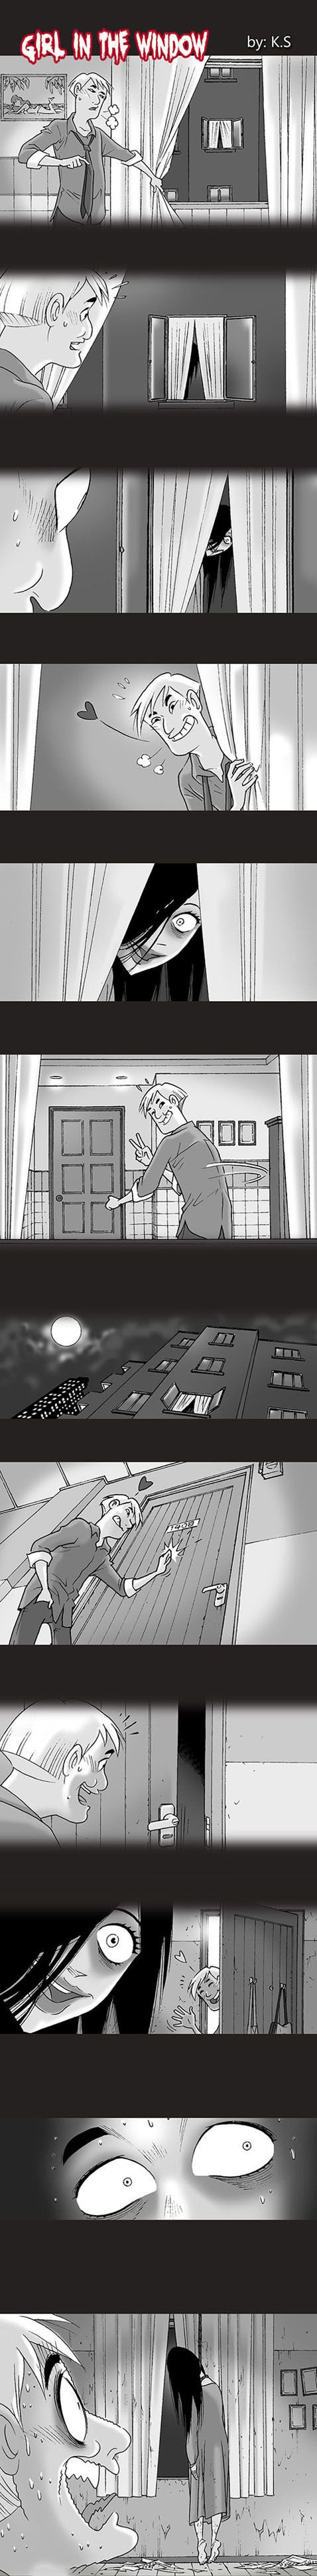 otra pequeña historia de terror (o humor negro) another little horror story (or dark humor story)